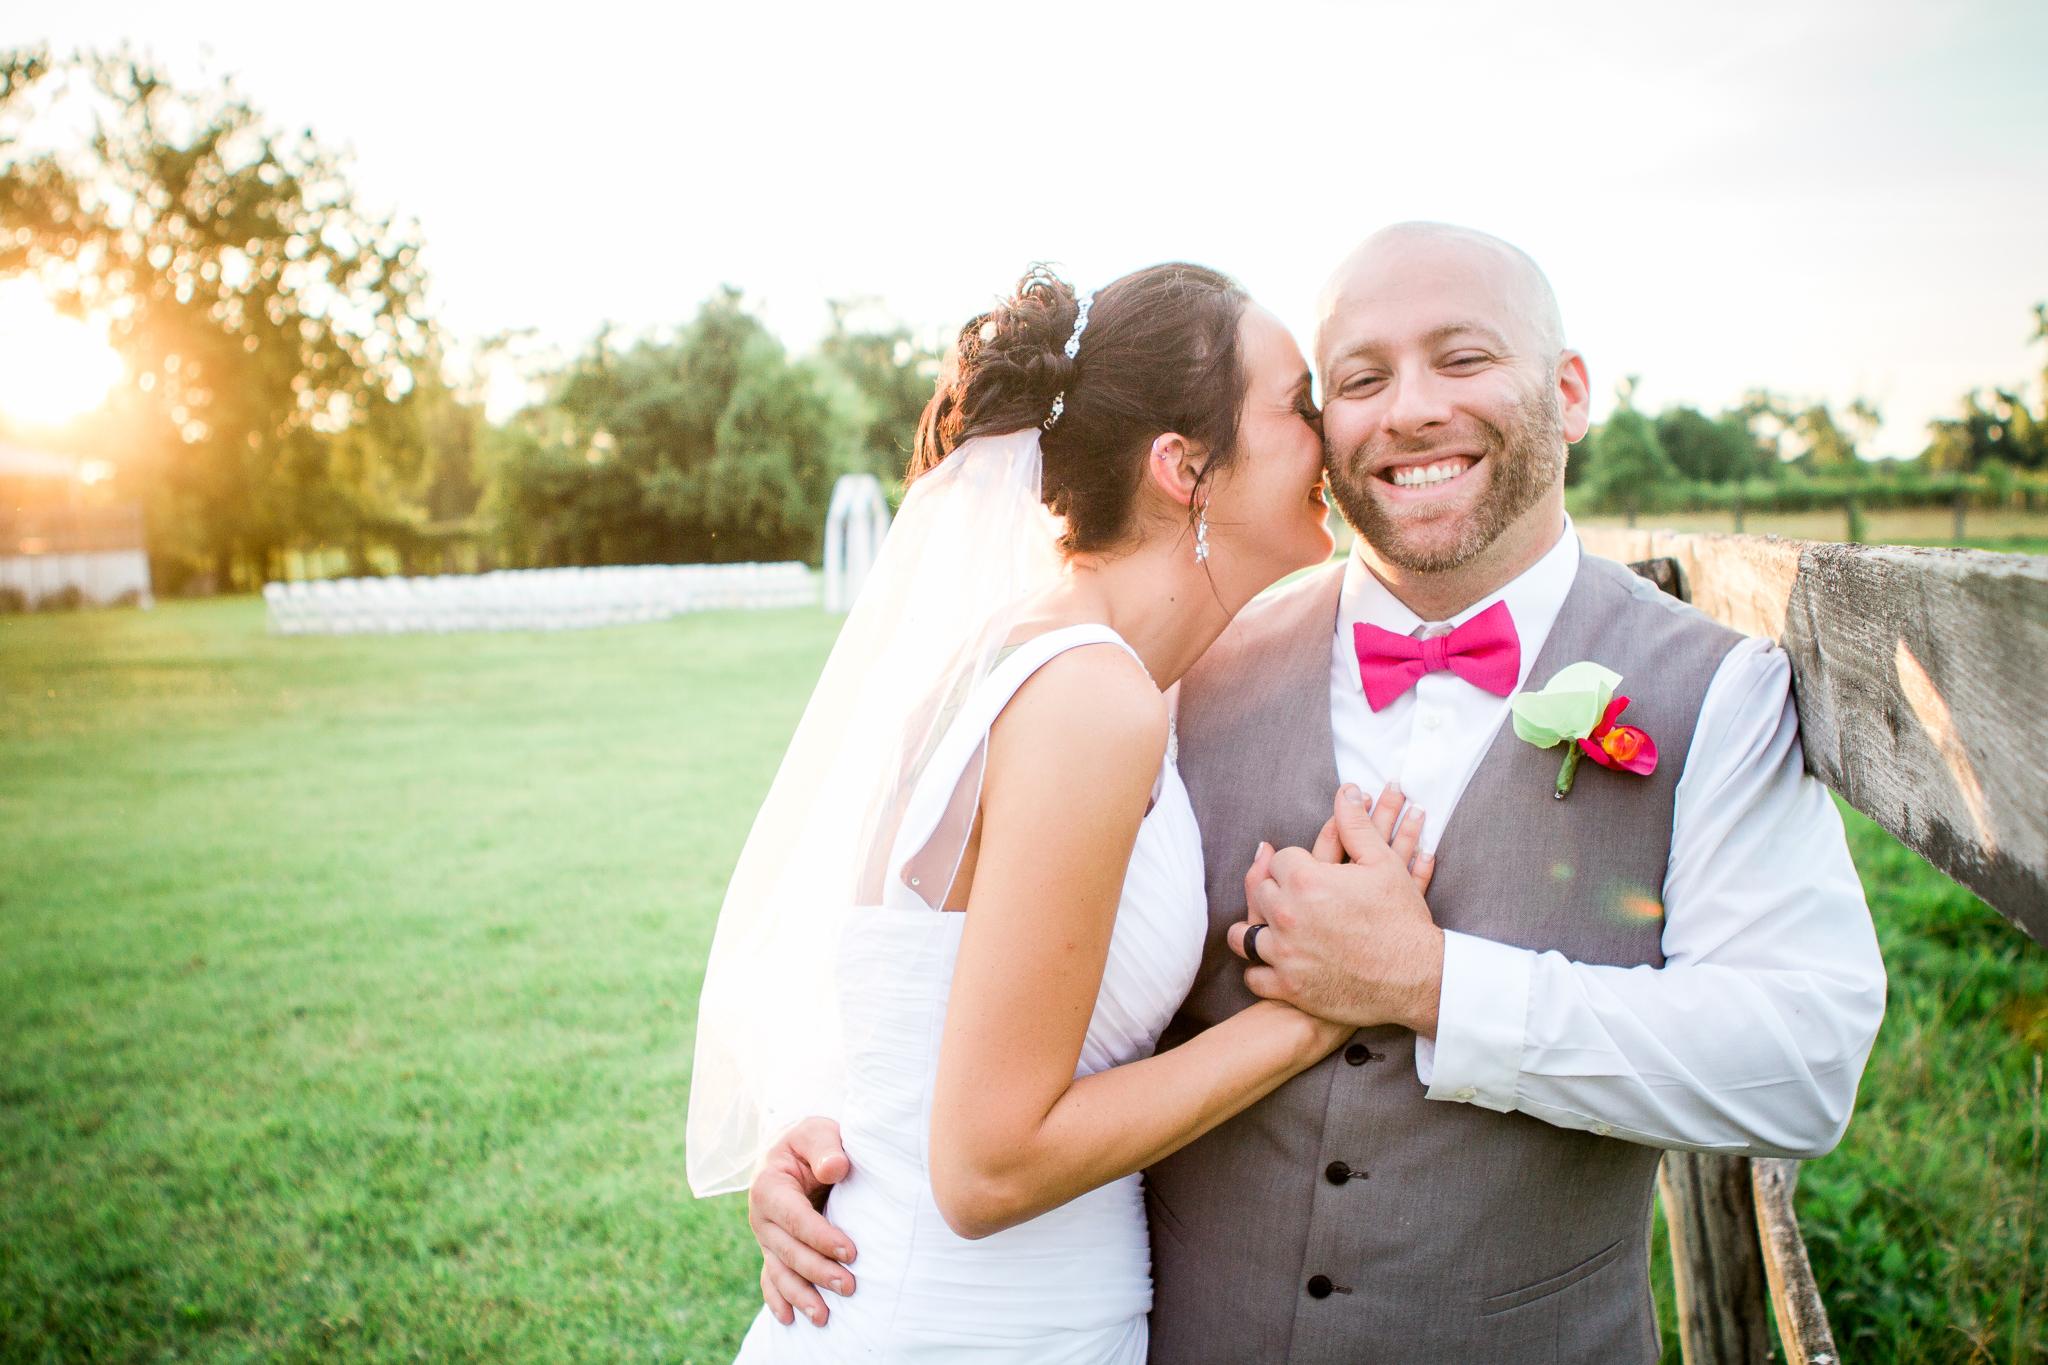 Richmond Kentucky Wedding Photographer - Ariana Jordan Photography -11-2.jpg